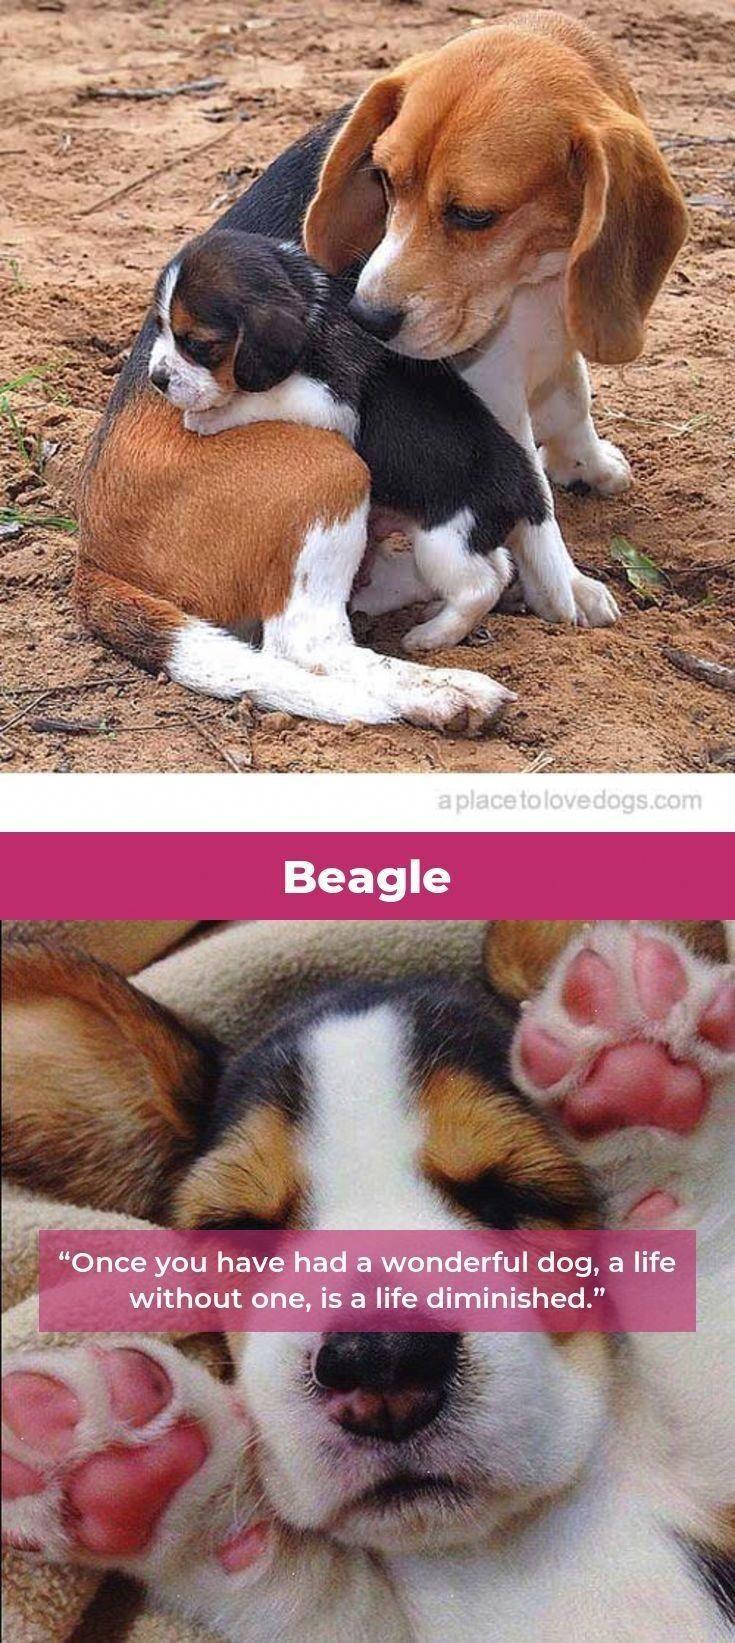 Beagle Dogs Beagle Dogs Beagle Dog Beagle